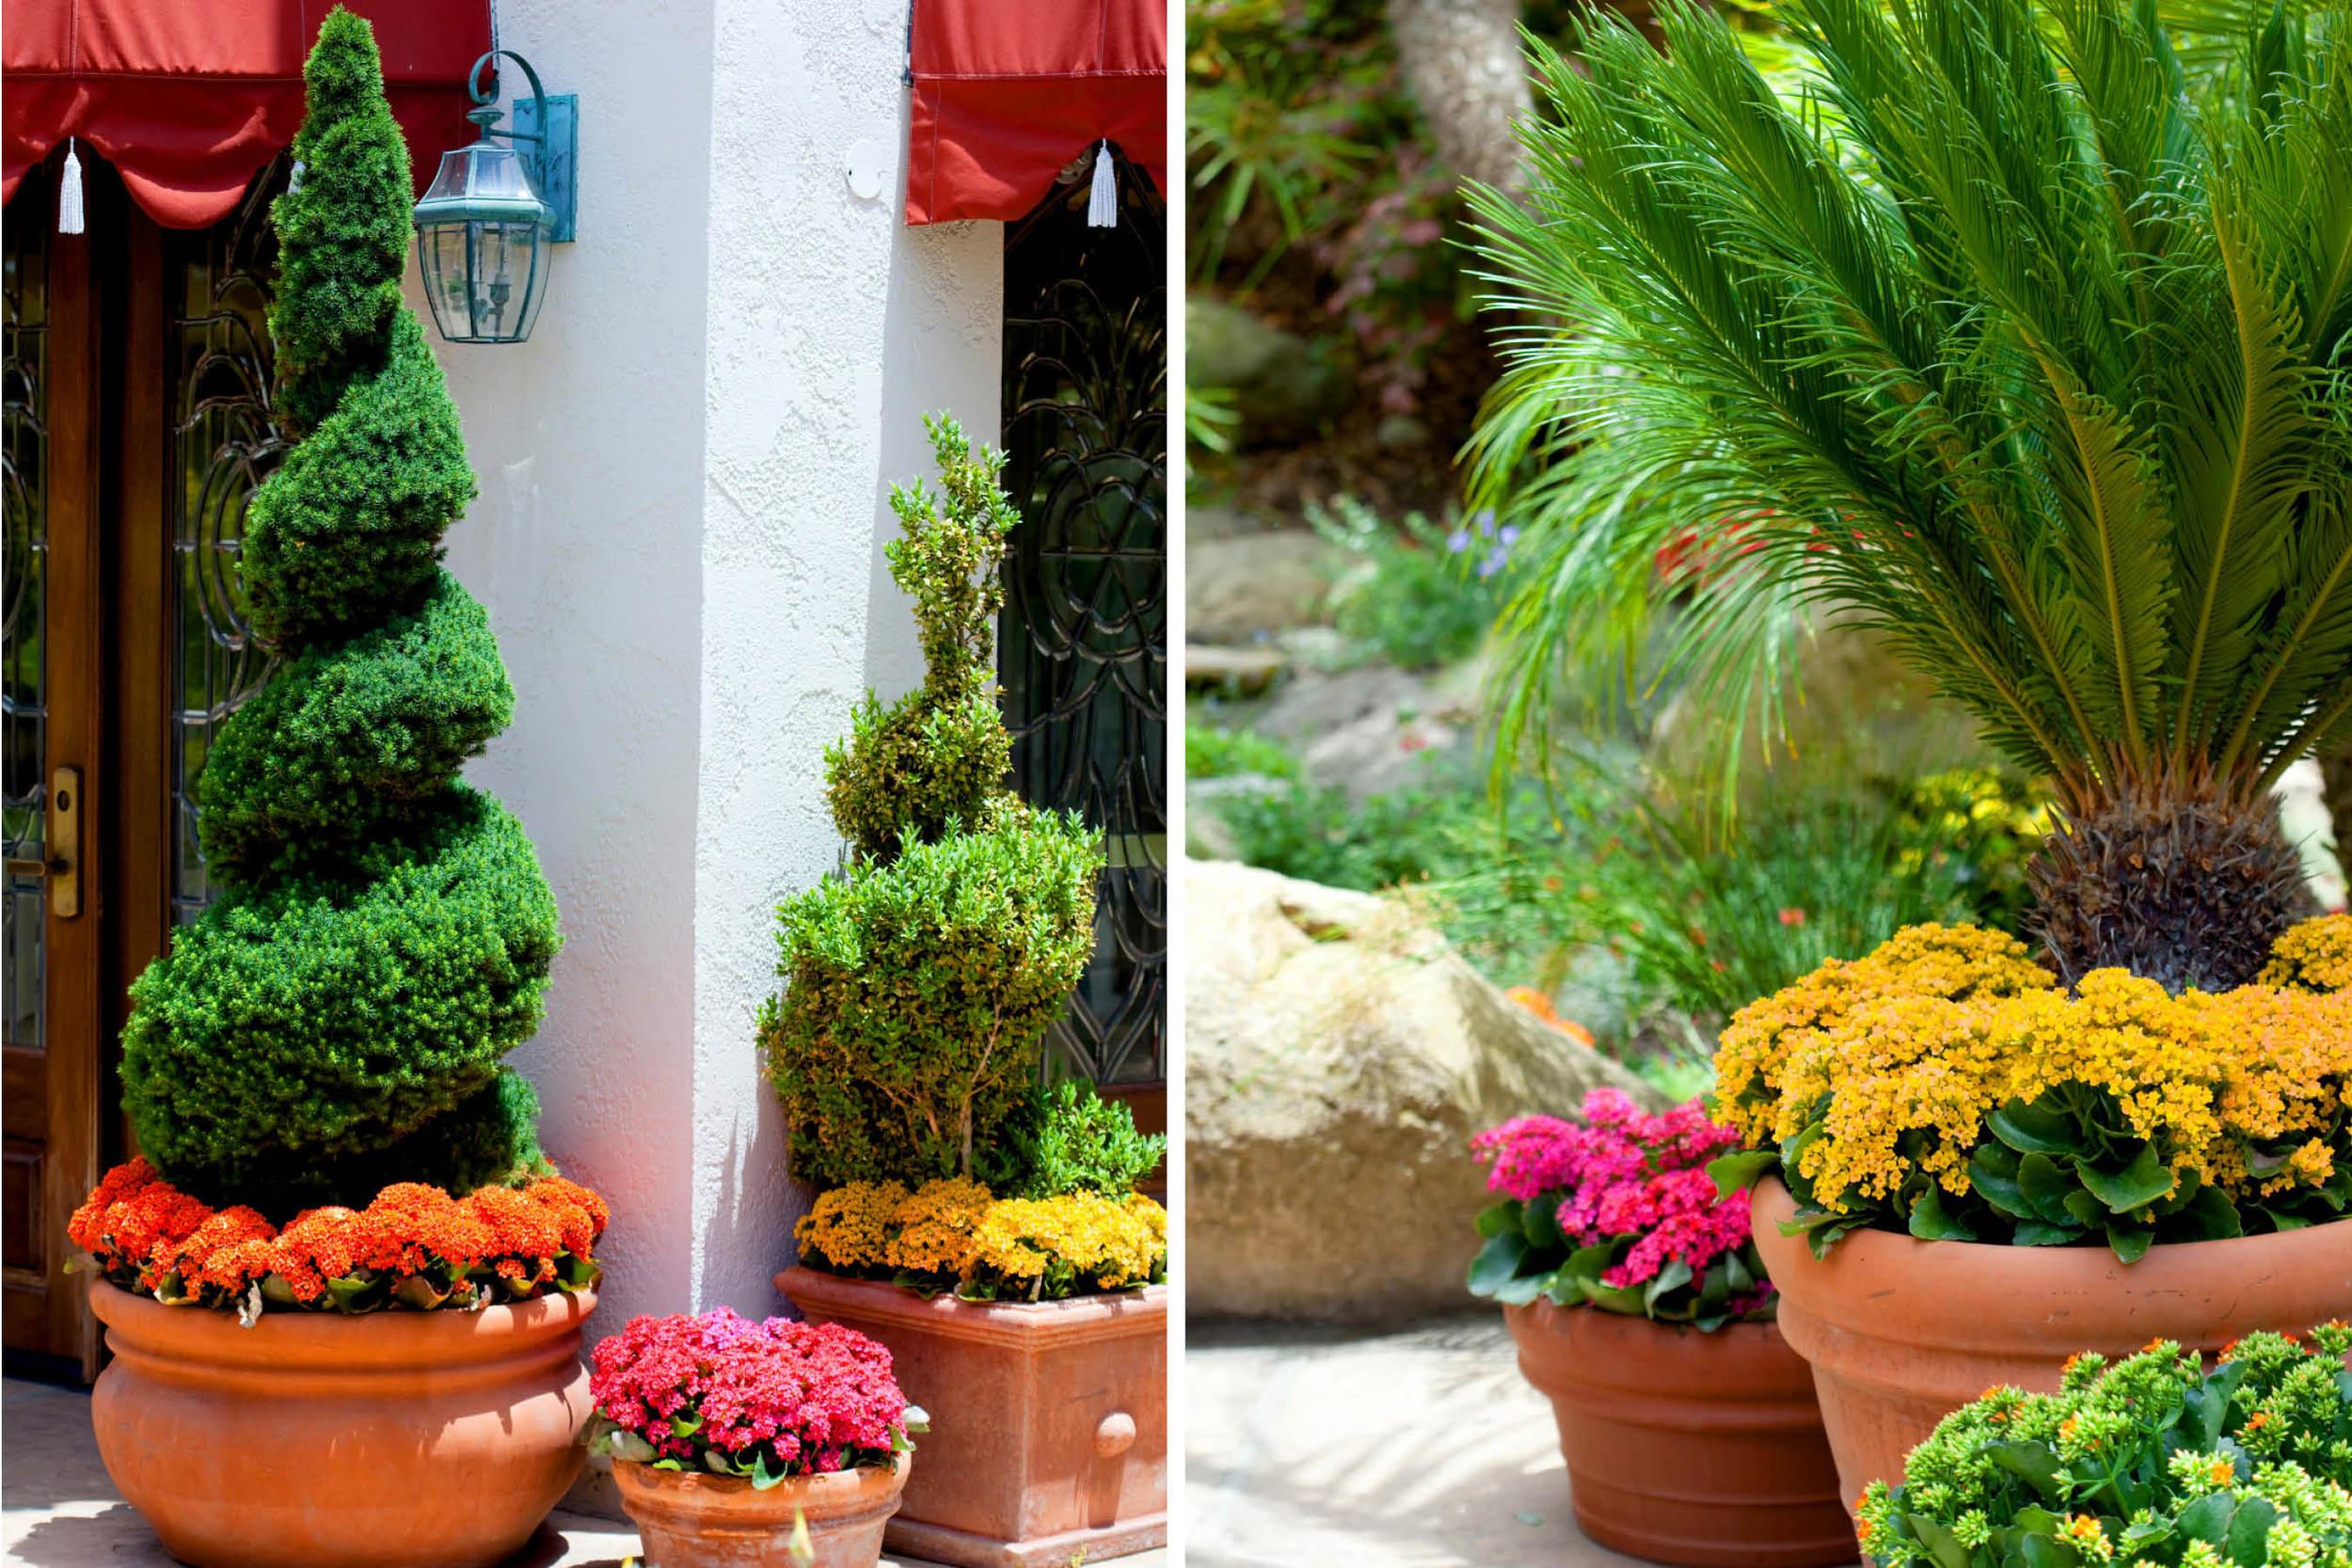 the-village-gardener-home-staging-plants-patio-decor-maintenance-interior-orchids-santa-barbara-carpinteria-losangeles-pasadena-santaynez (1).jpg